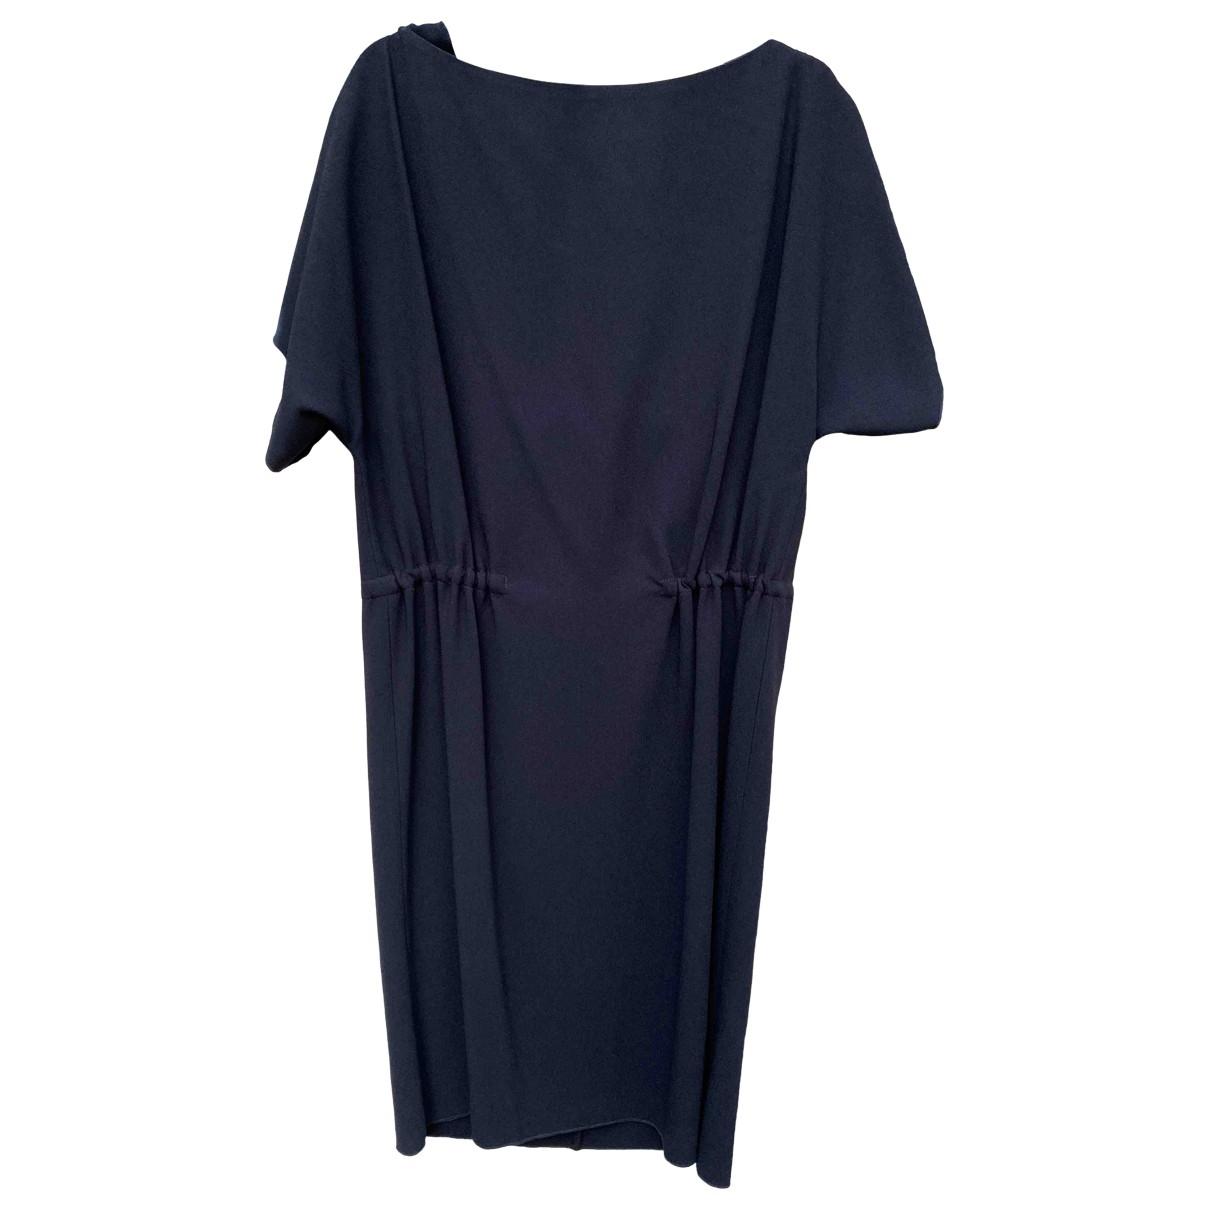 Tara Jarmon \N Black dress for Women 36 FR